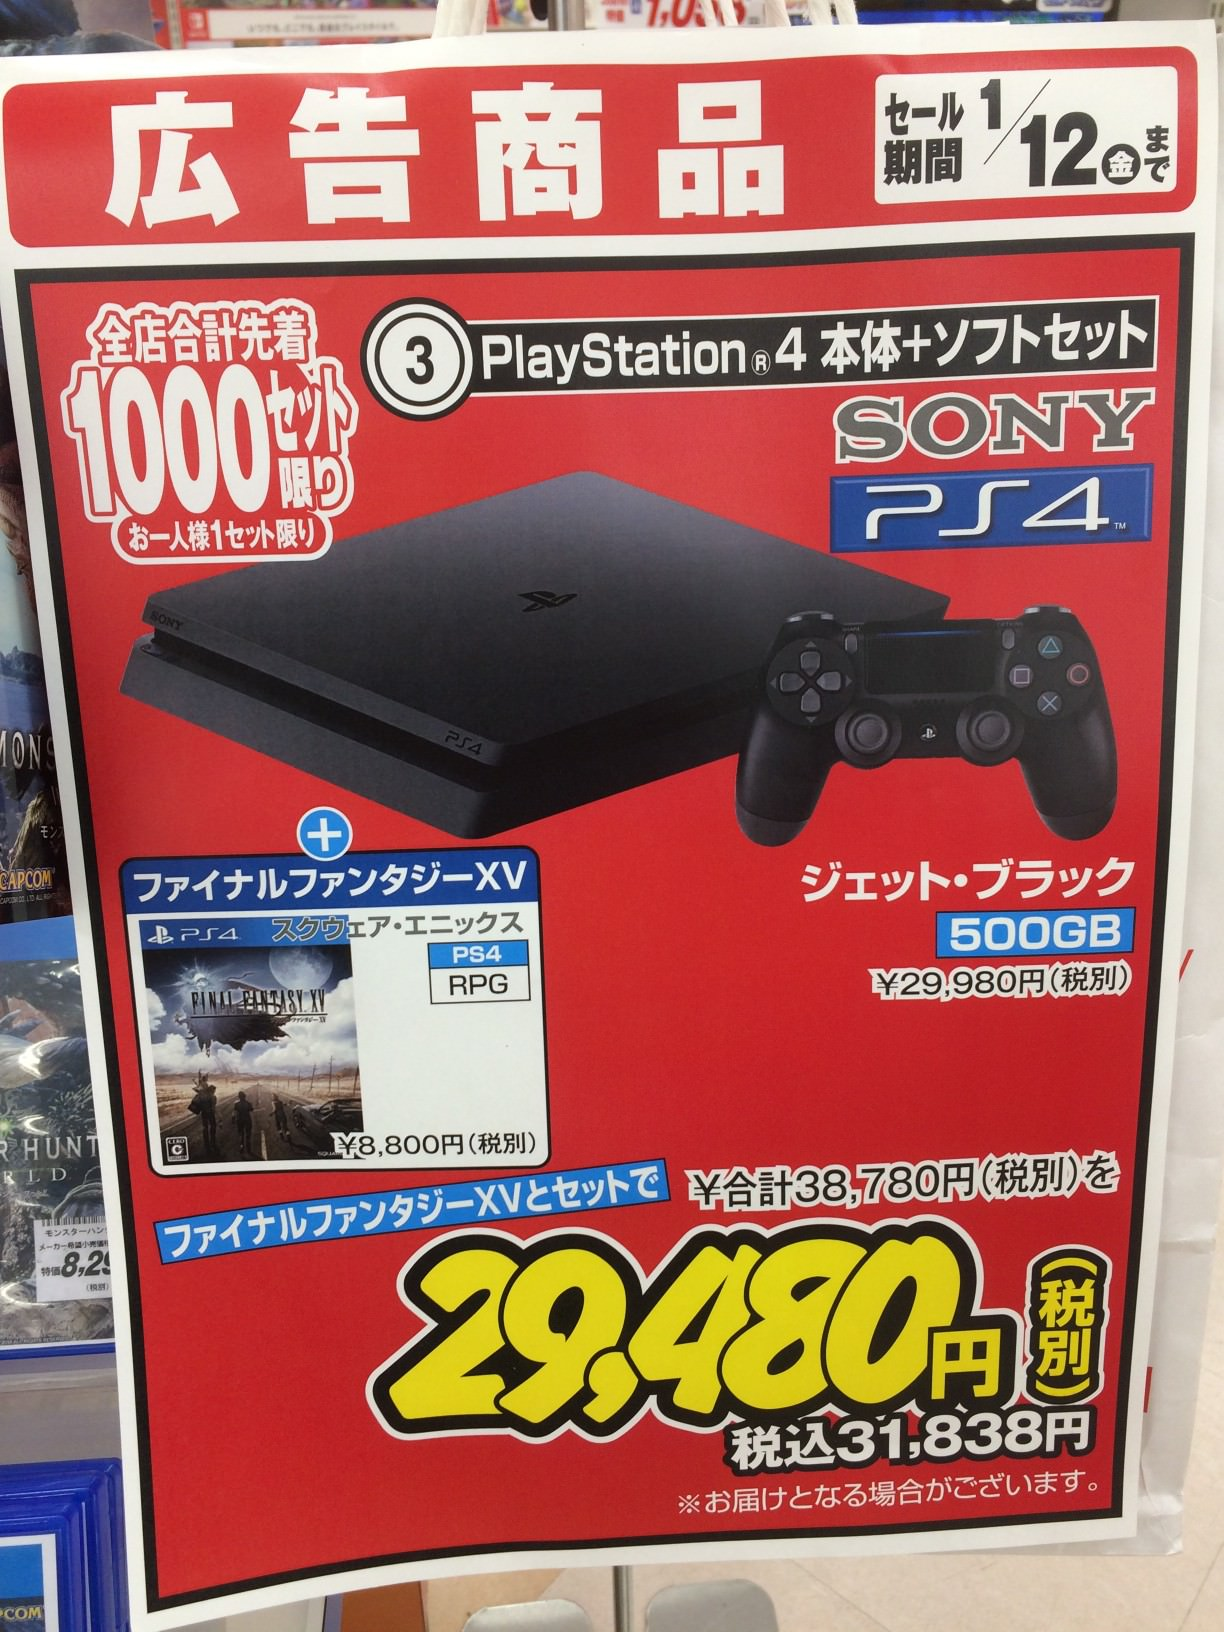 jzLcVTXWD98zg - 【悲報】ジョーシンでFF15の販売価格がマイナス500円に突入してしまう!